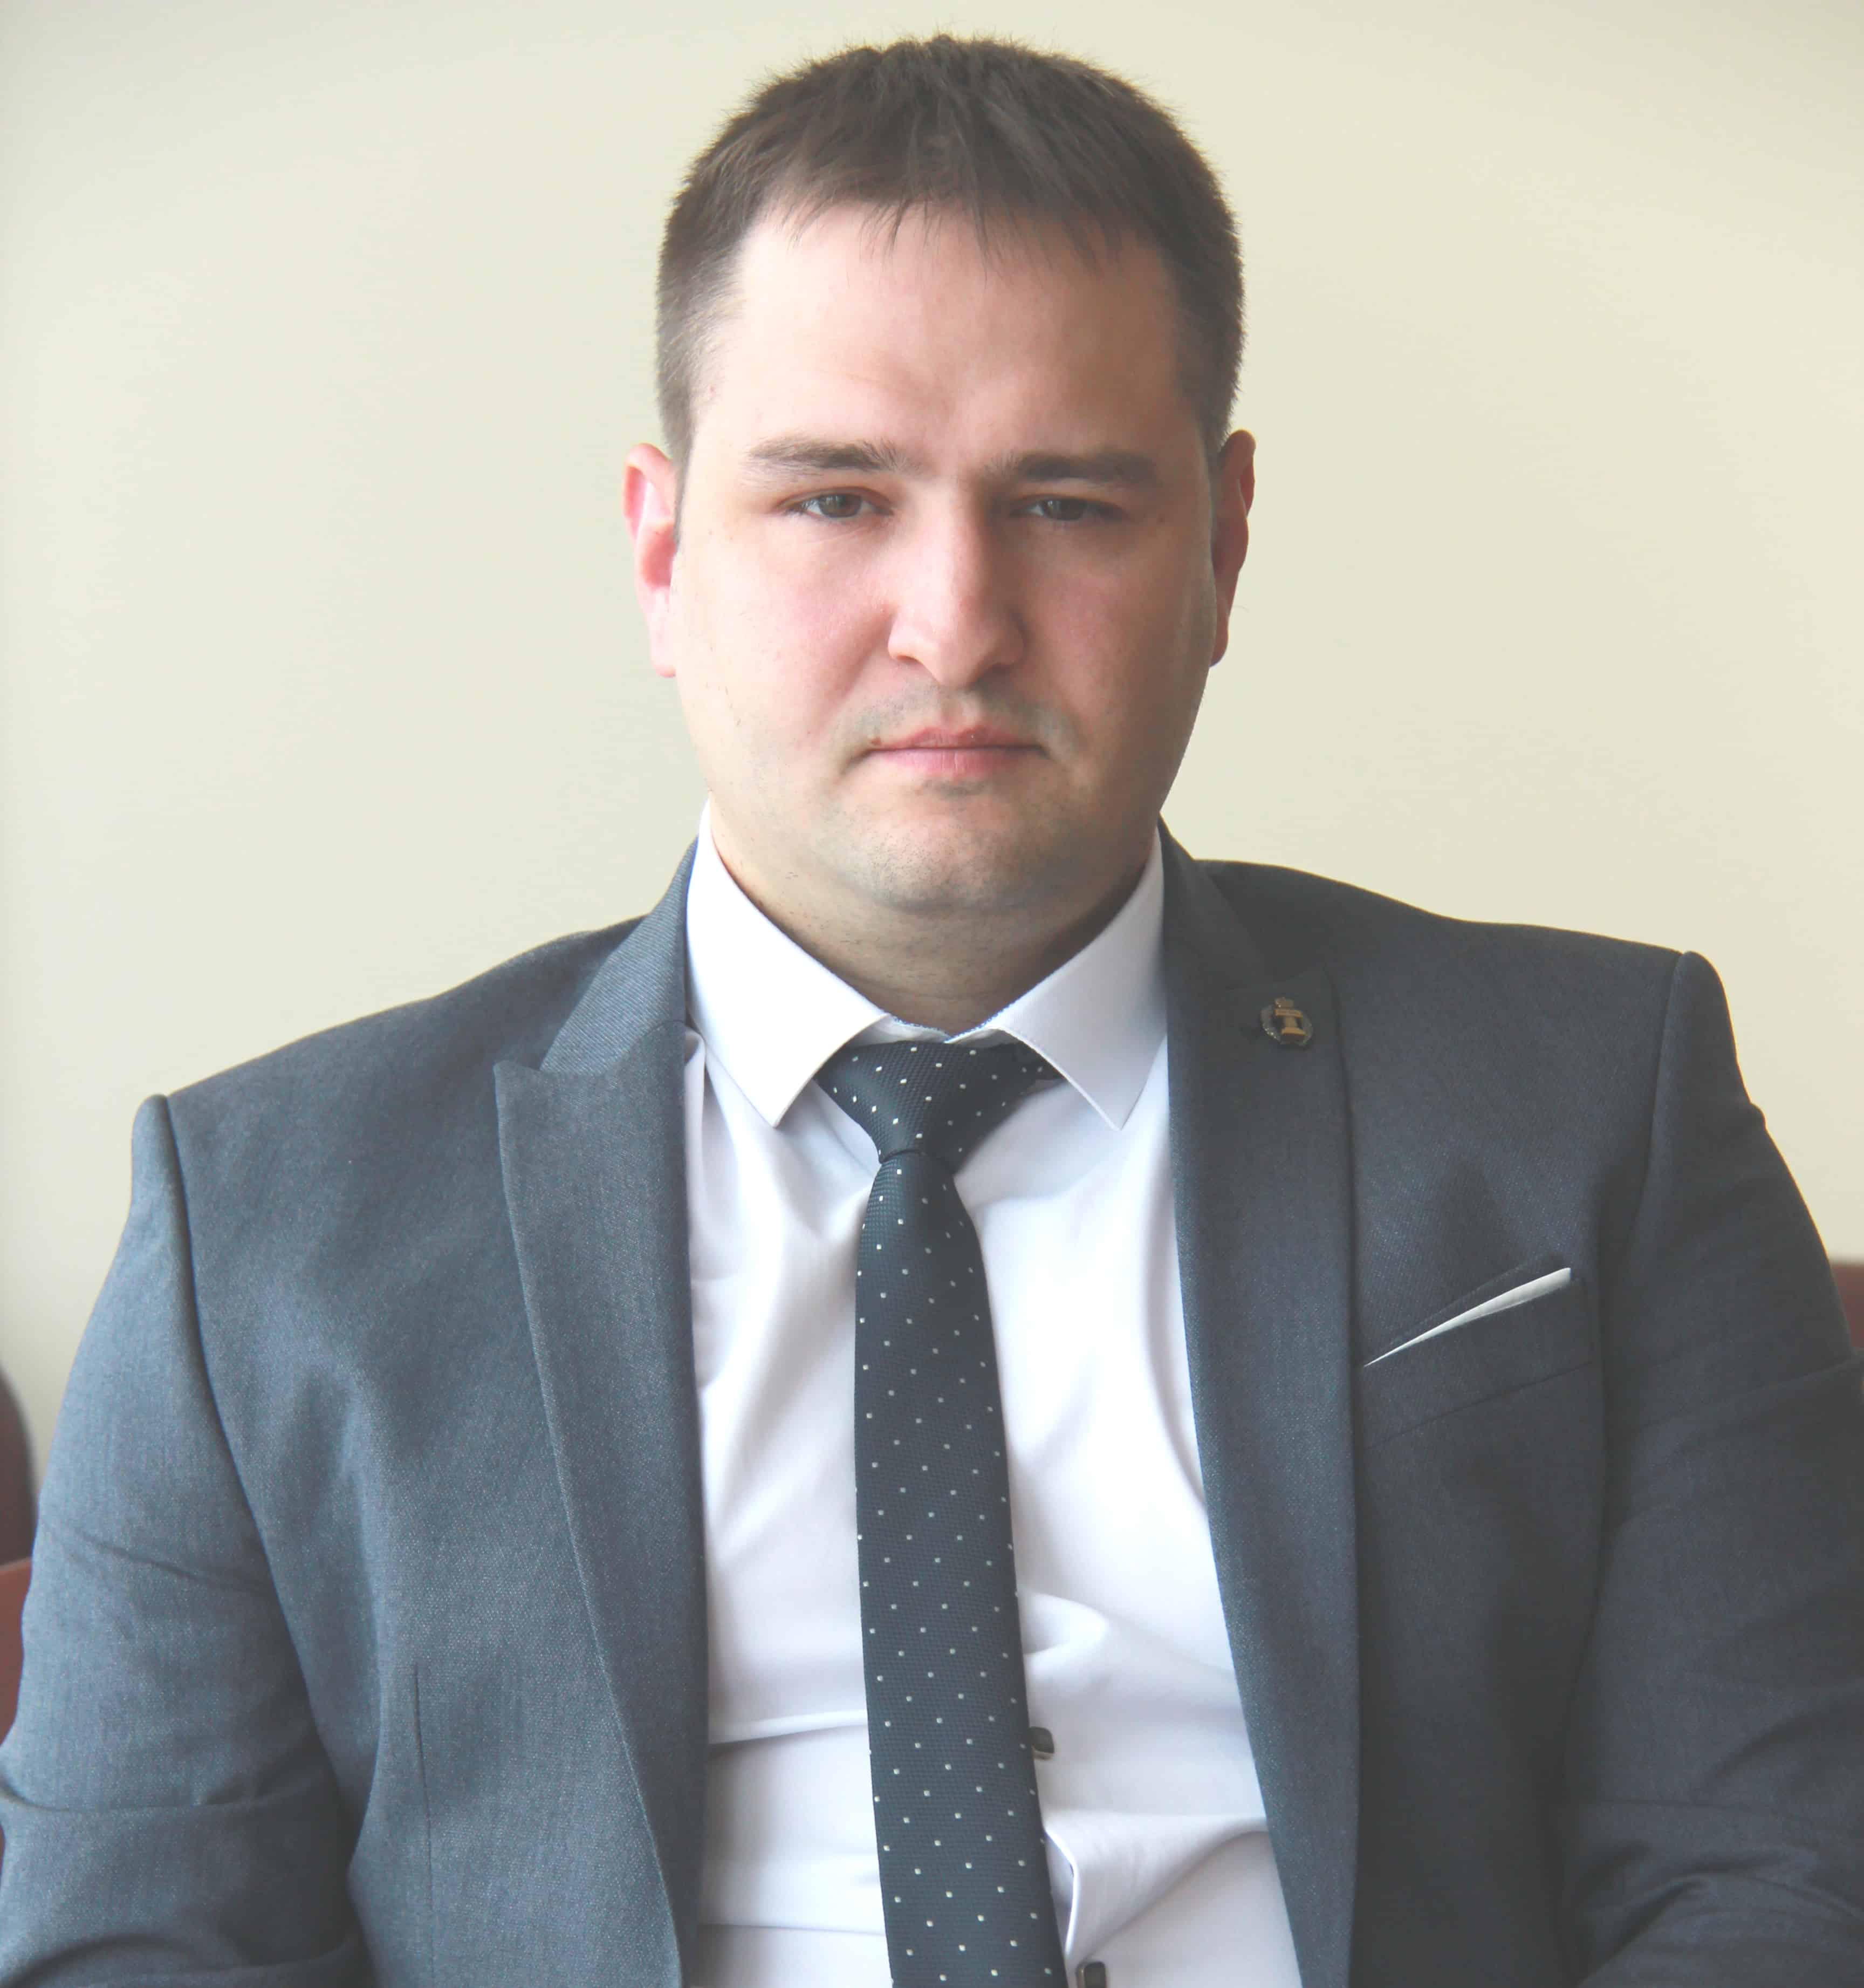 юридические консультации онлайн волгоград